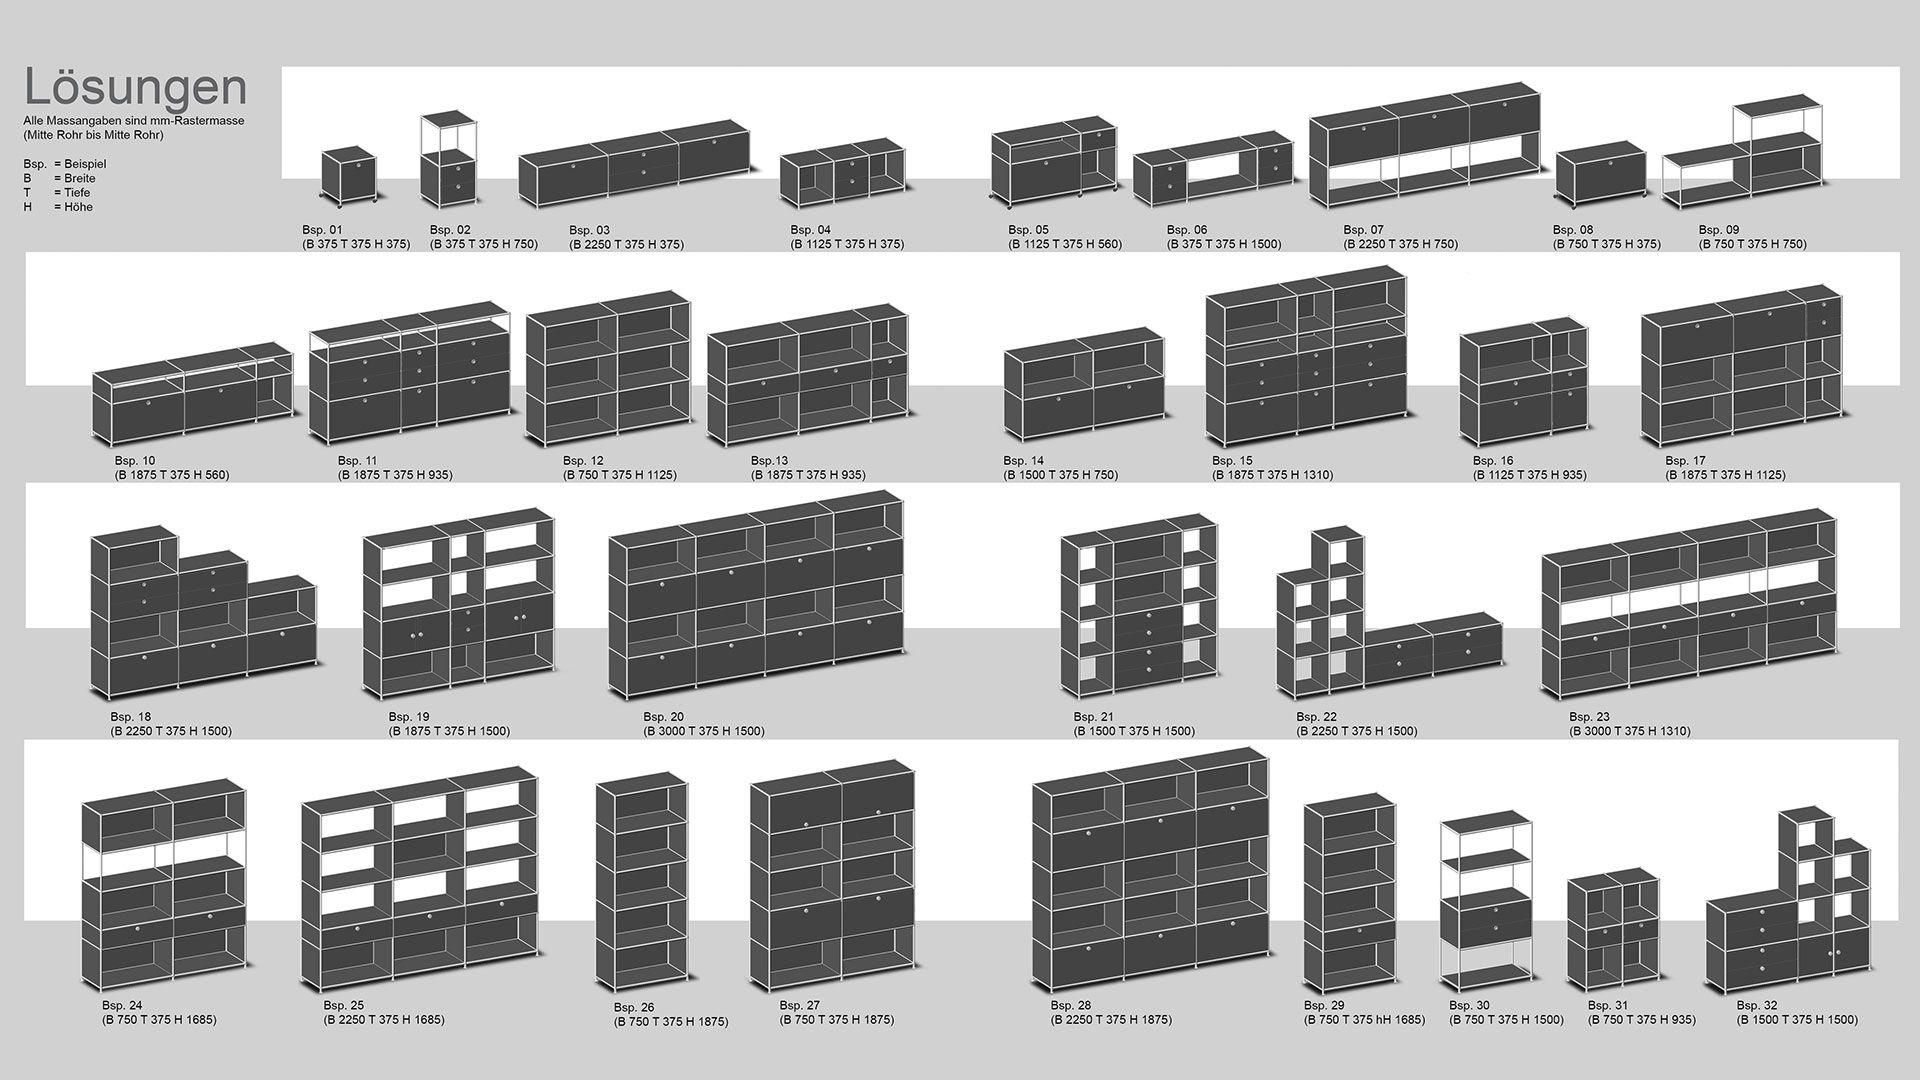 Bueromoebel Metall Sideboard Lowboard Highboard mit Klapptüren und ...